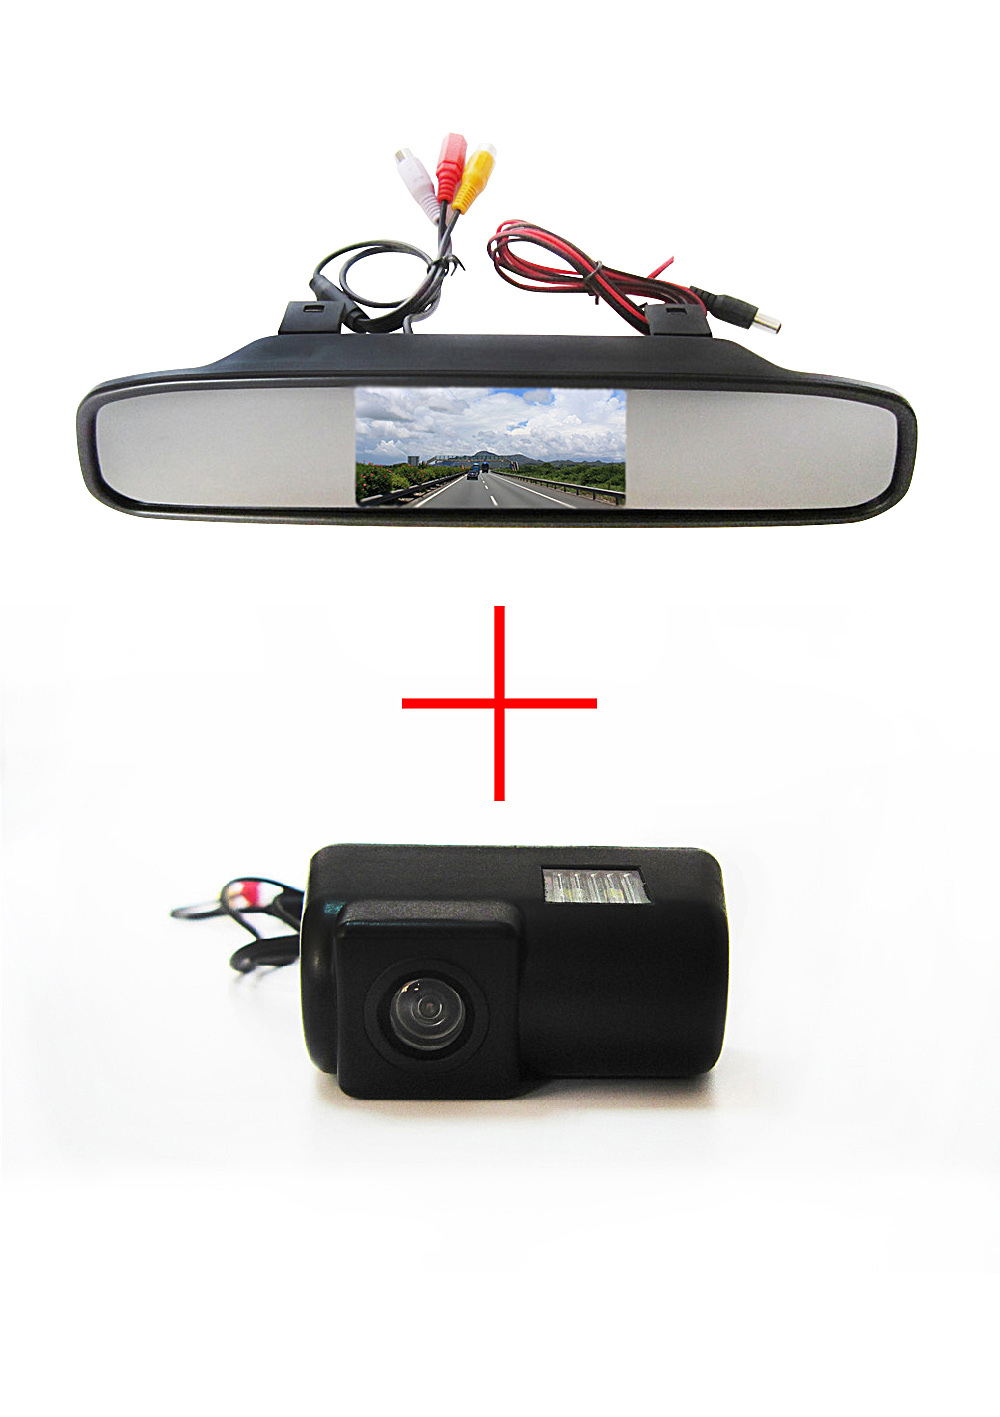 Здесь можно купить  Color CCD Chip Car Rear View Camera for Ford Transit connect + 4.3 Inch  rearview Mirror Monitor  Автомобили и Мотоциклы